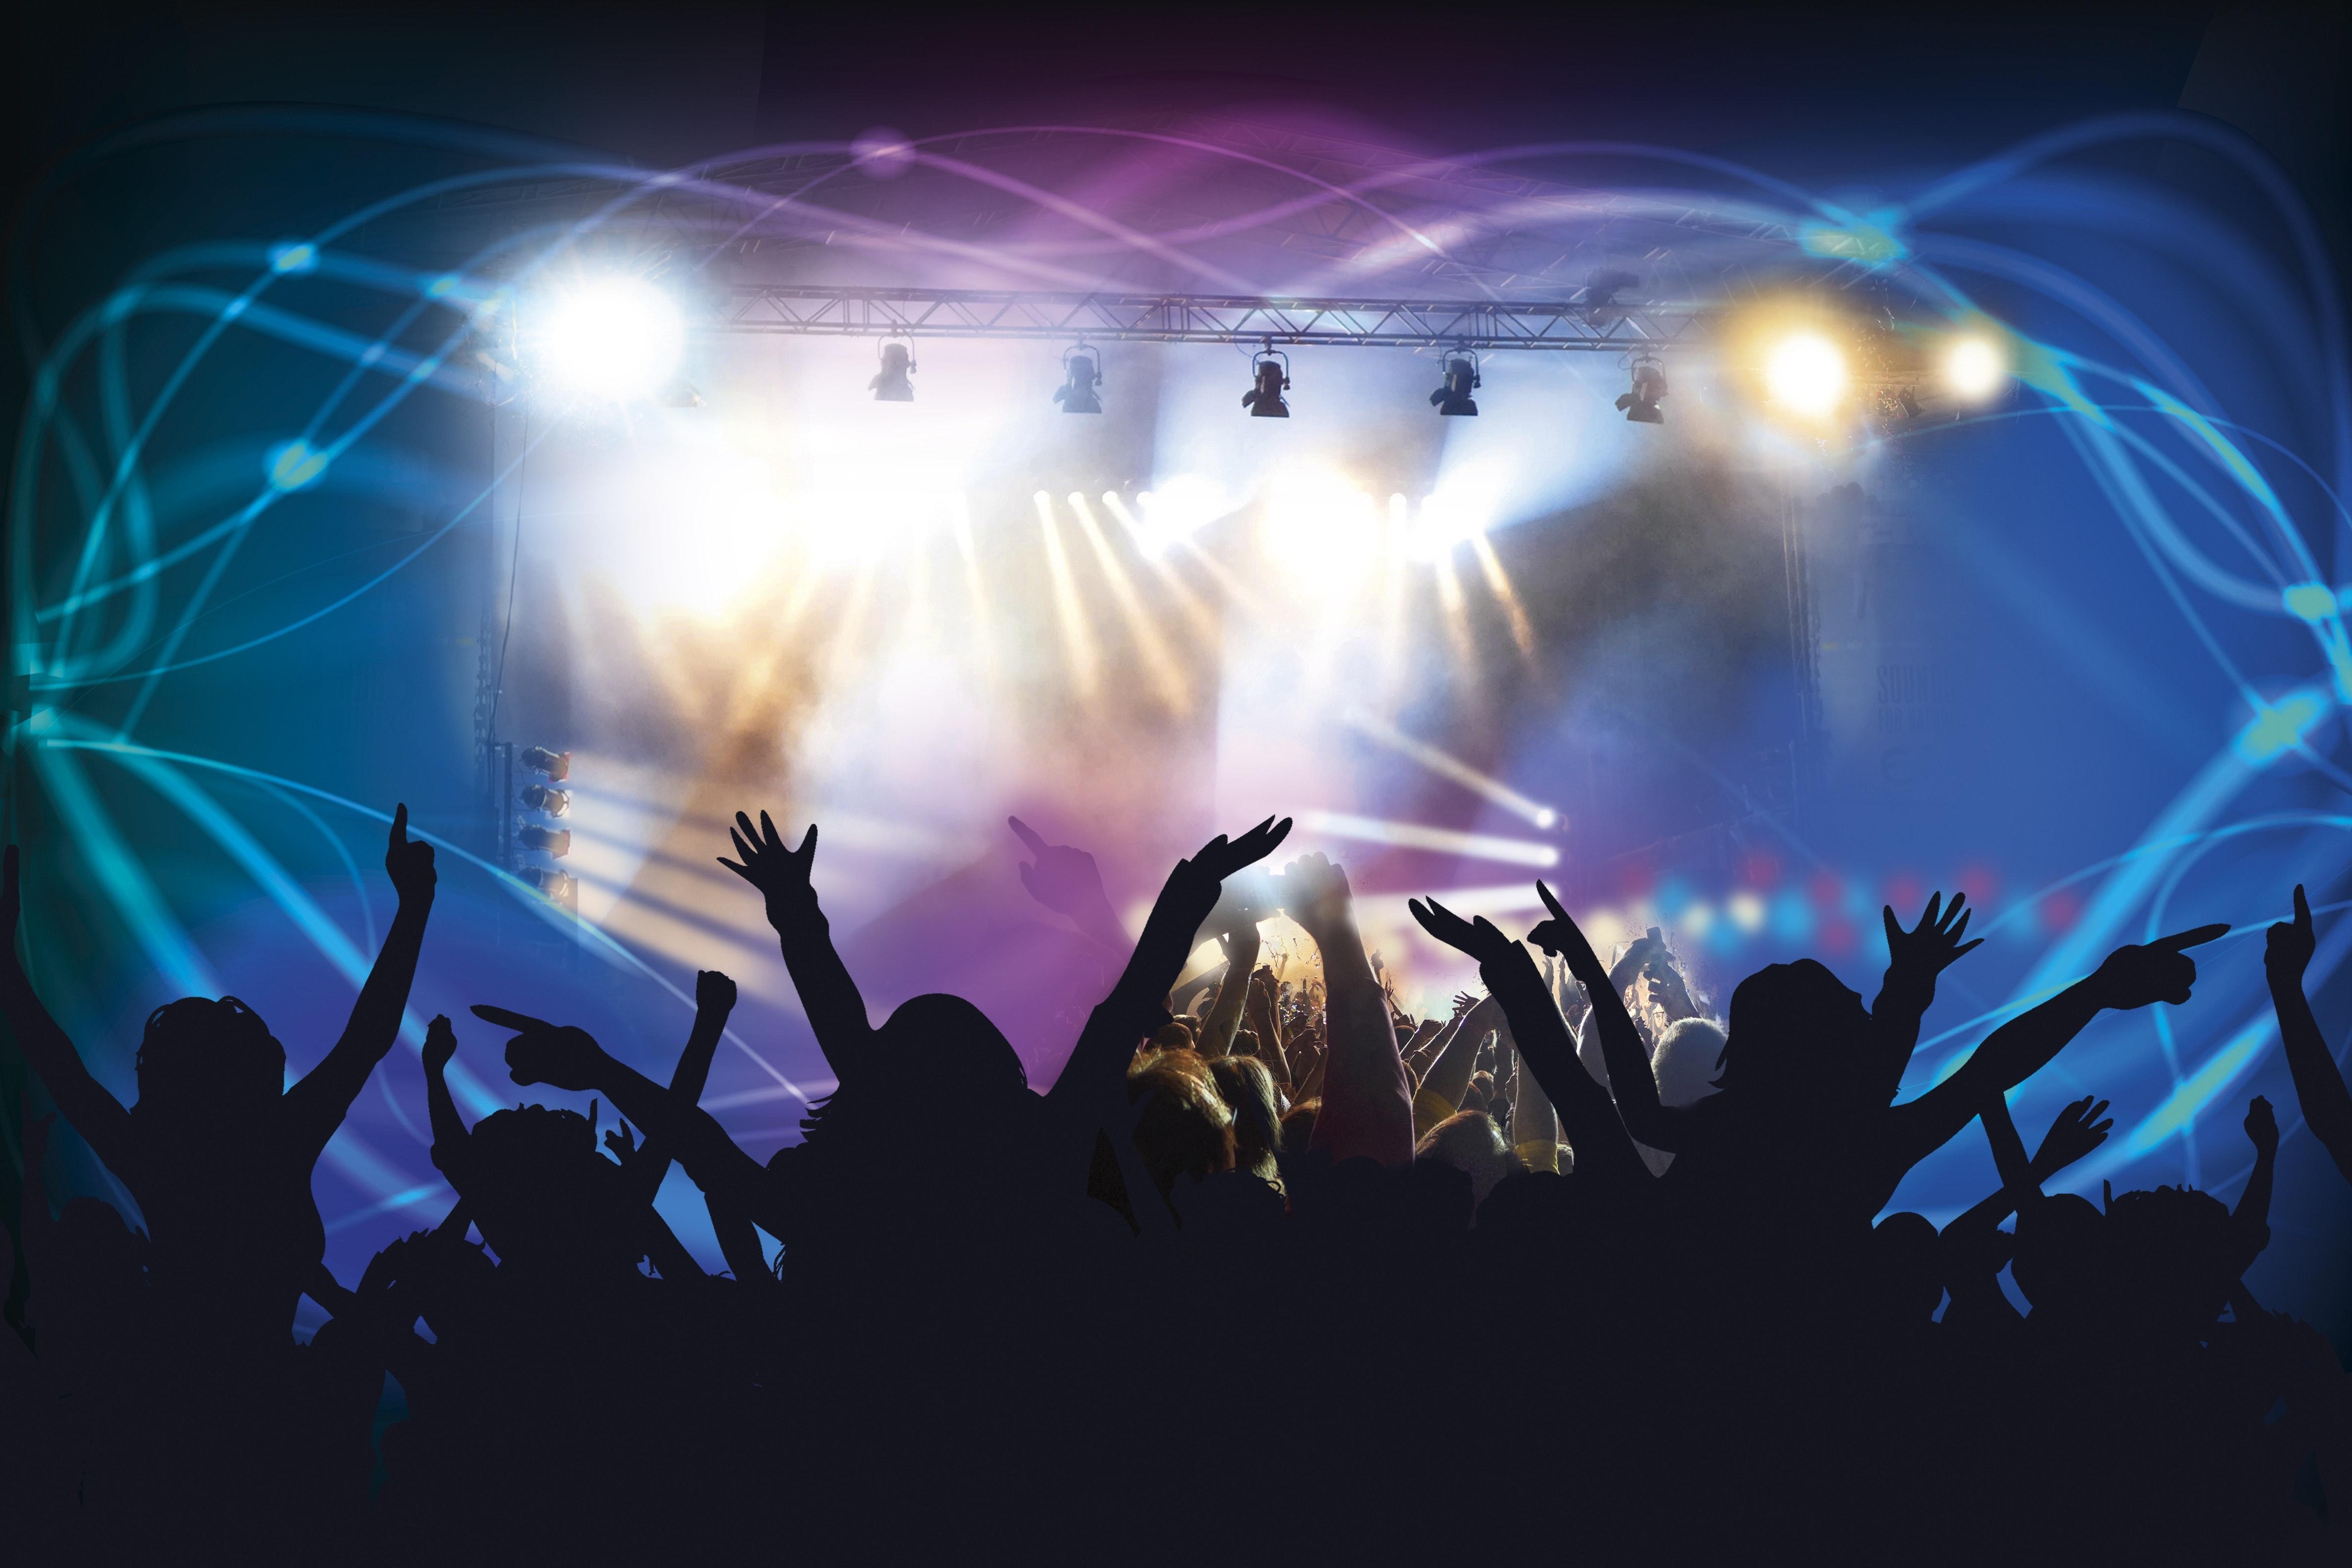 cheerful-club-concert-2143.jpg